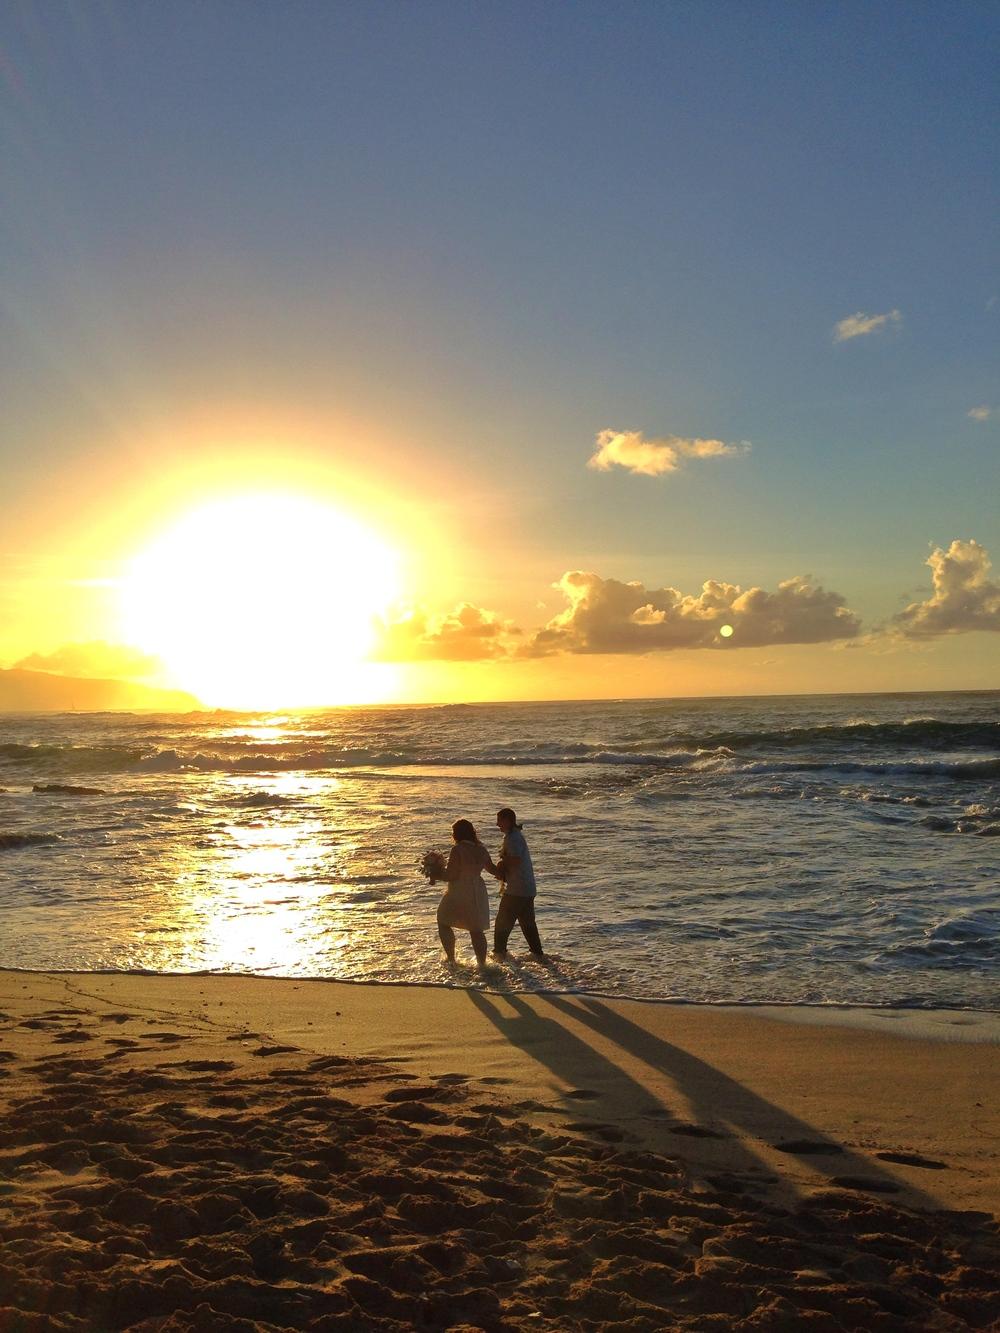 jacqueline-caleb-hawaii-beach-north-shore-sunset